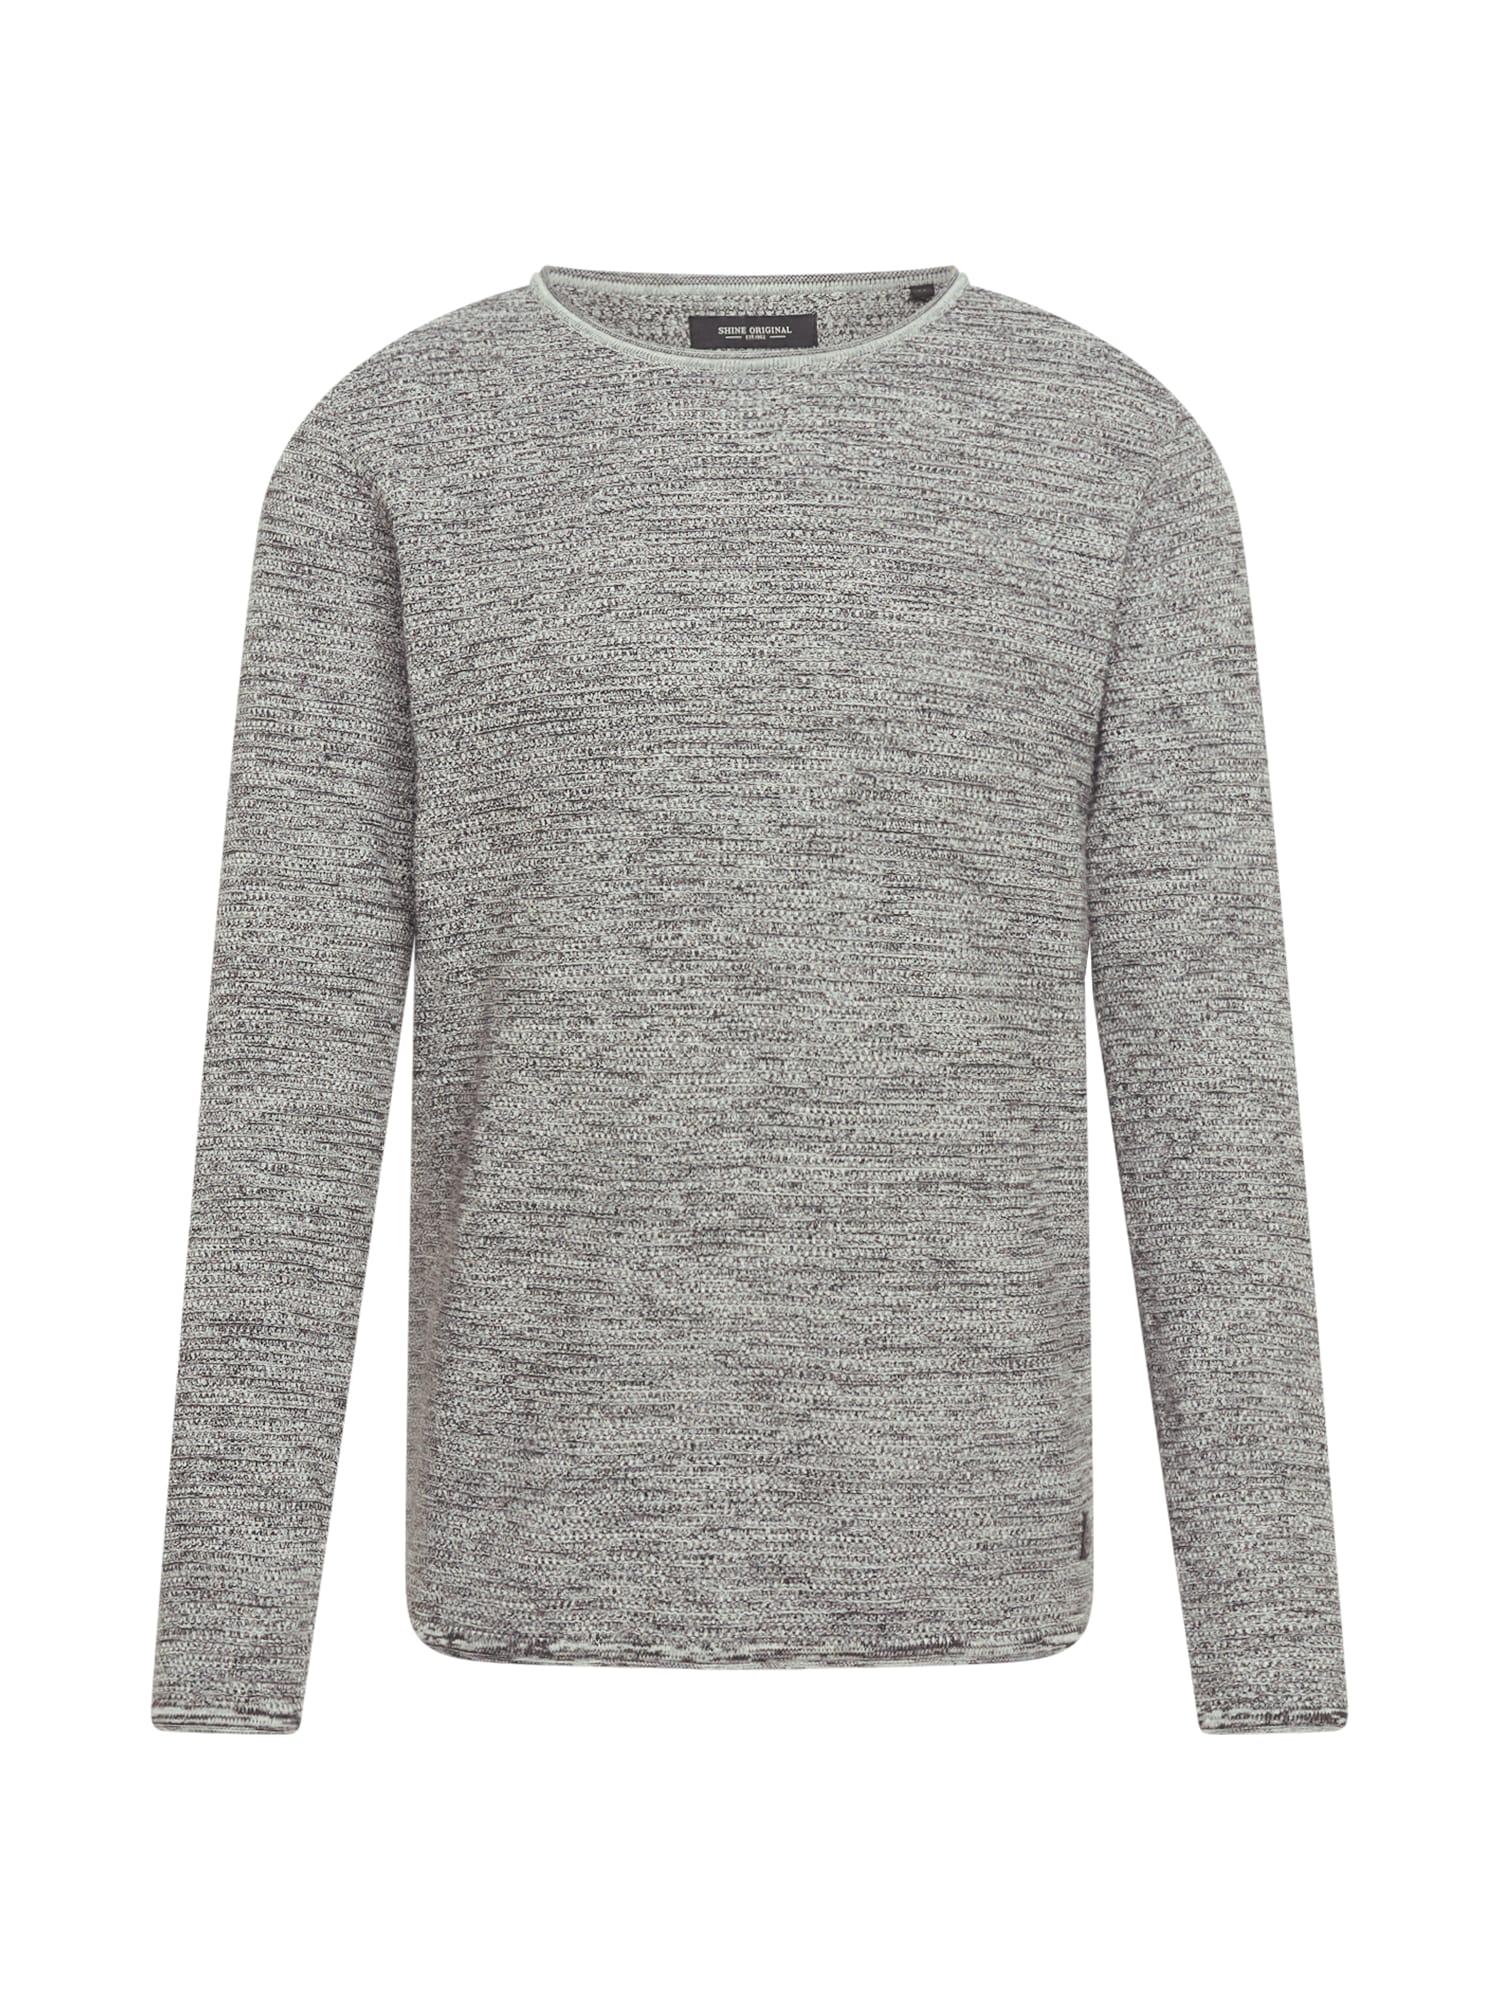 SHINE ORIGINAL Megztinis margai pilka